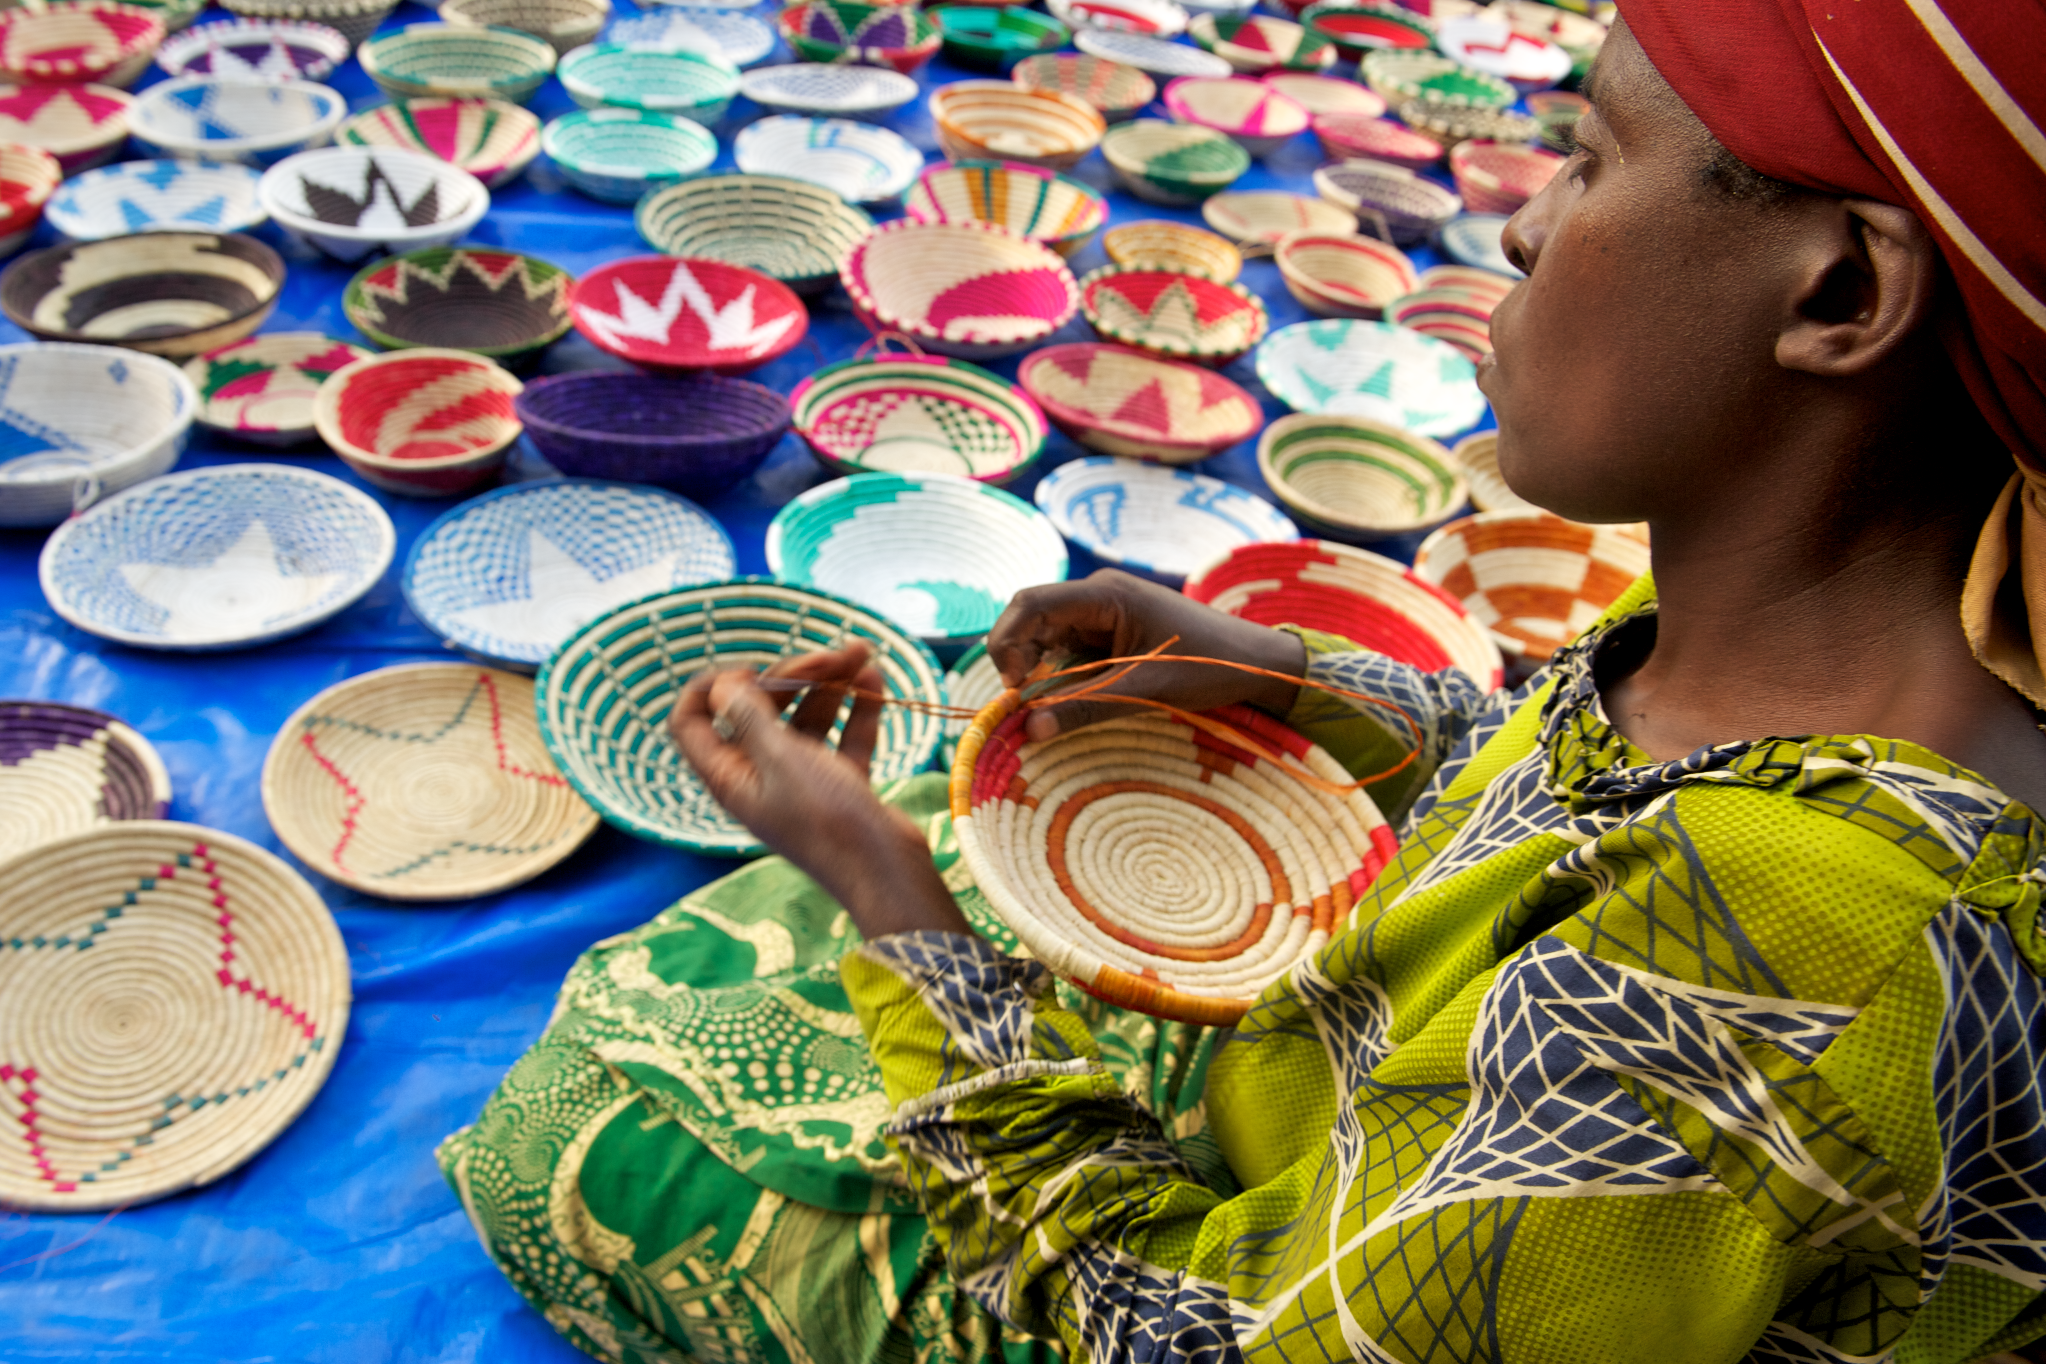 http://portraitrwanda.files.wordpress.com/2011/09/dsc_6593.png